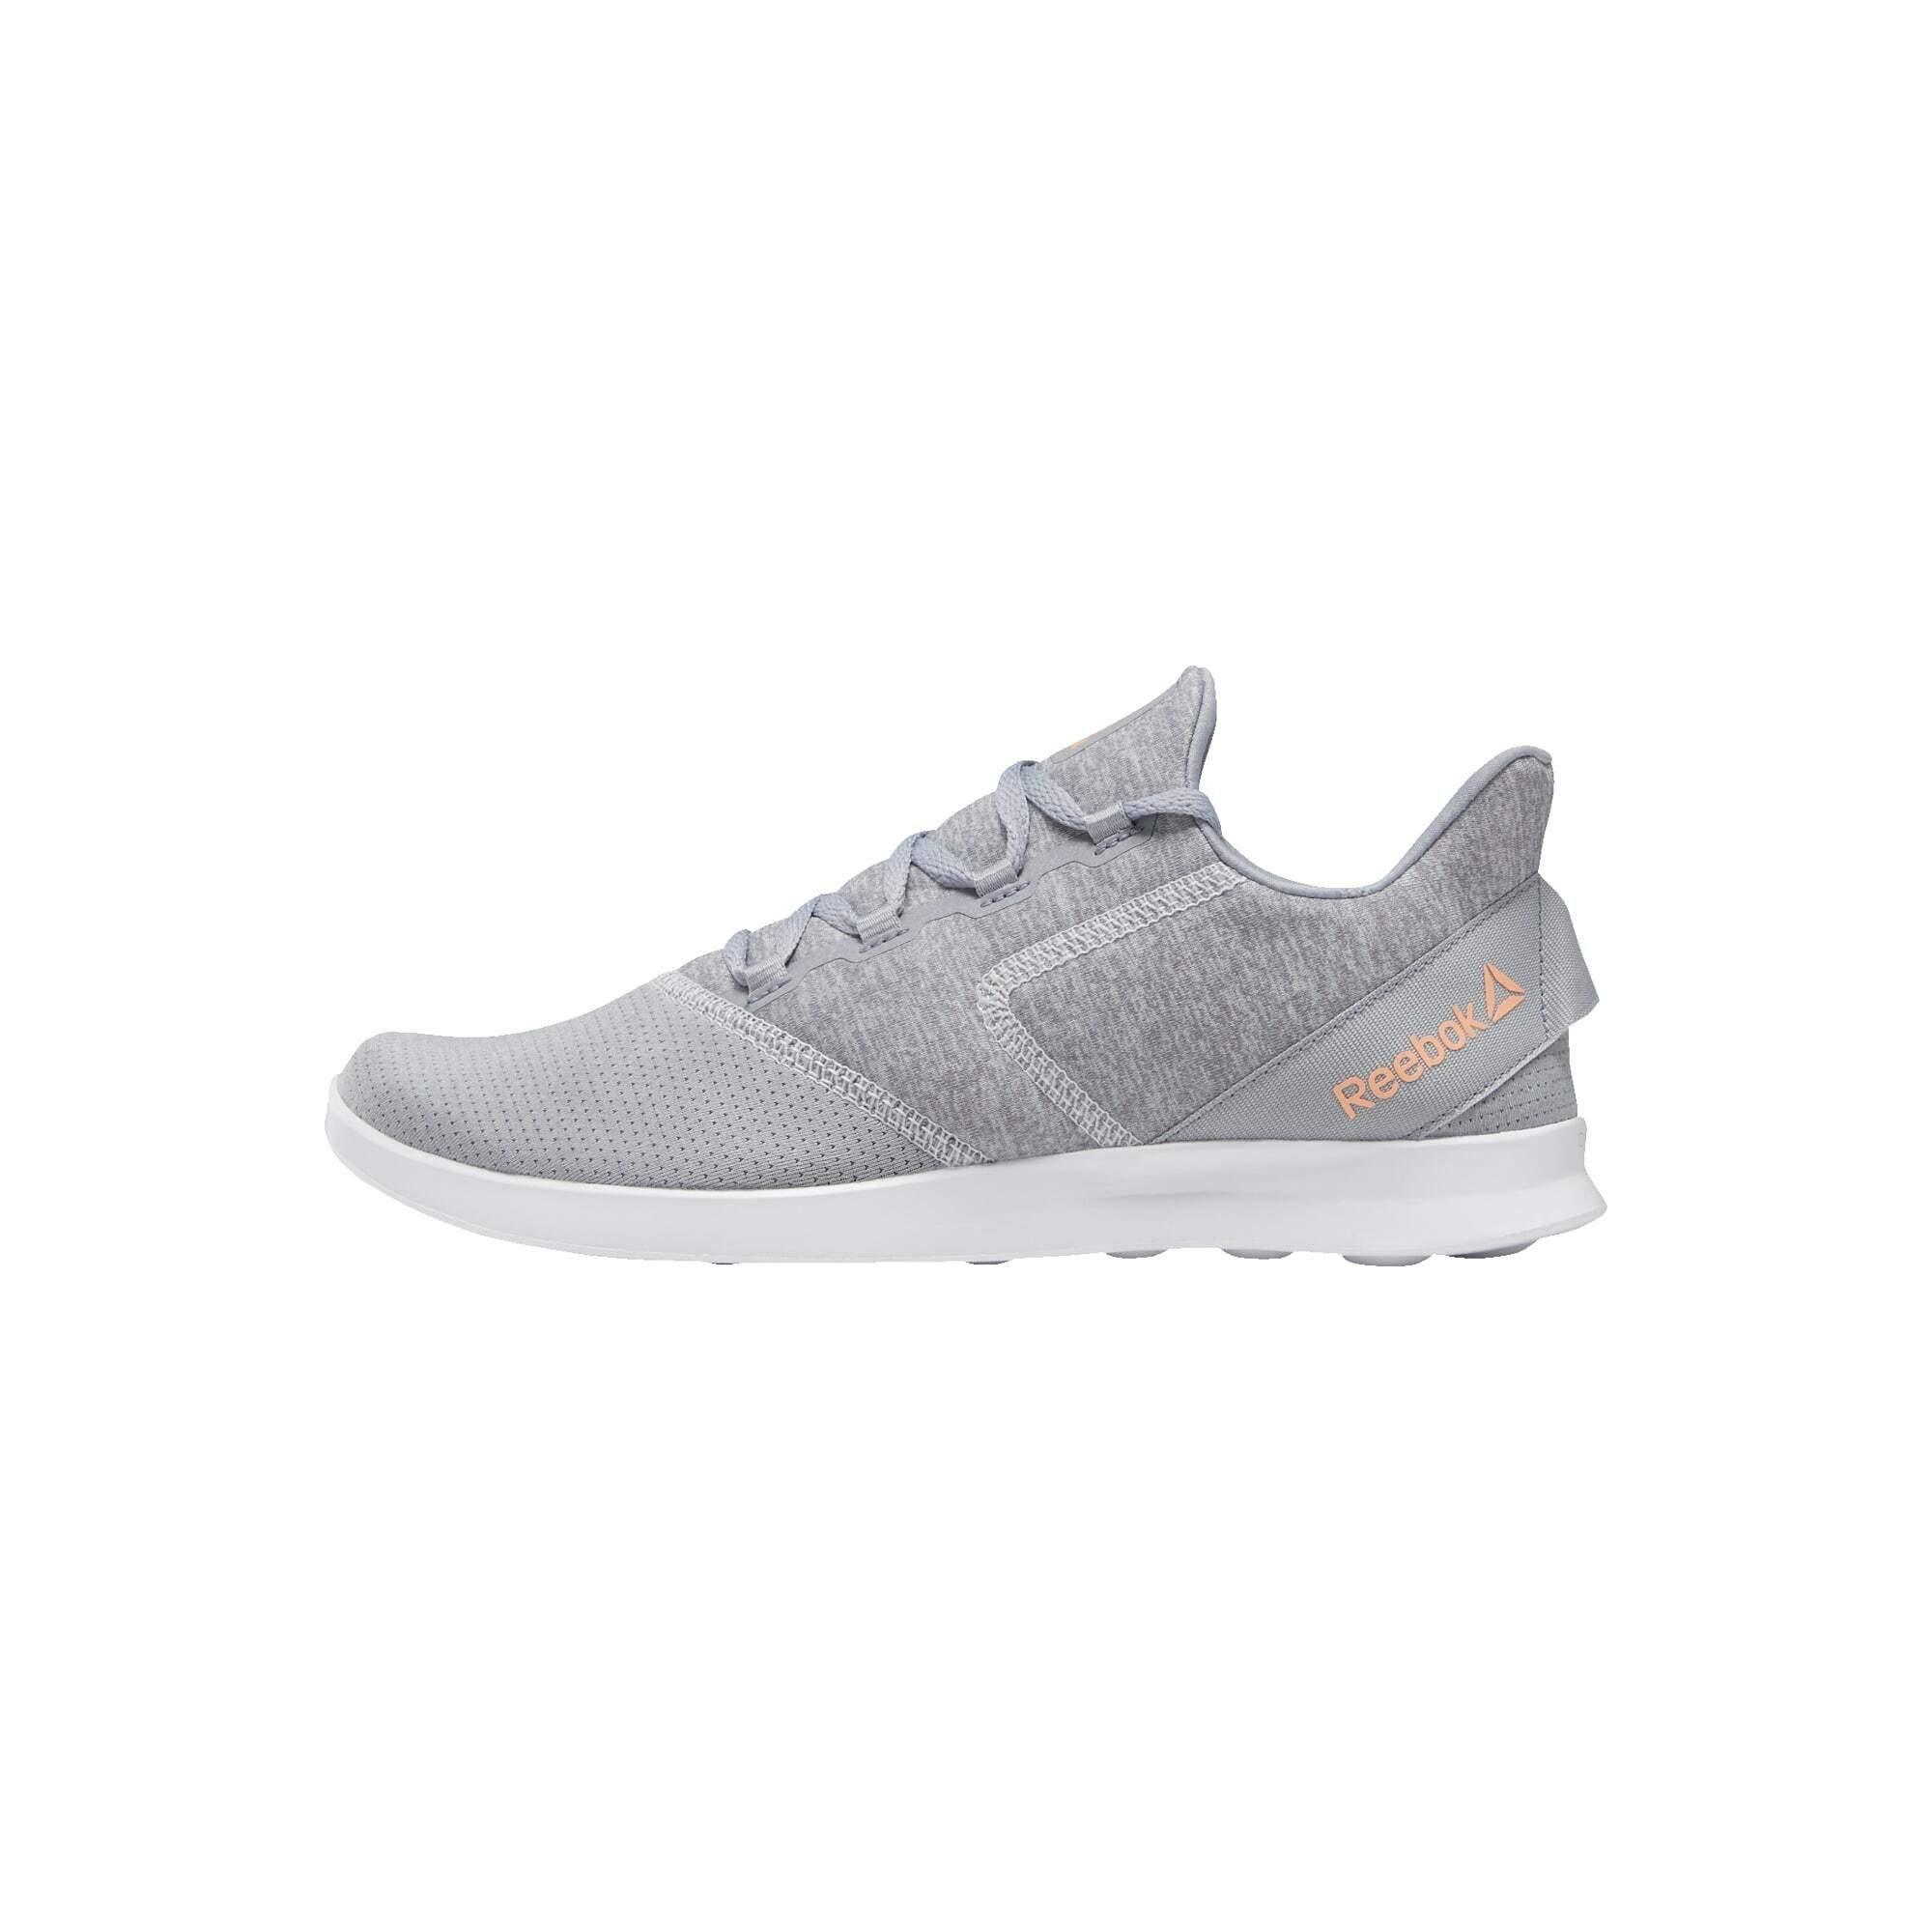 Reebok »Evazure DMX Lite 2.0 Shoes« Trainingsschuh | OTTO